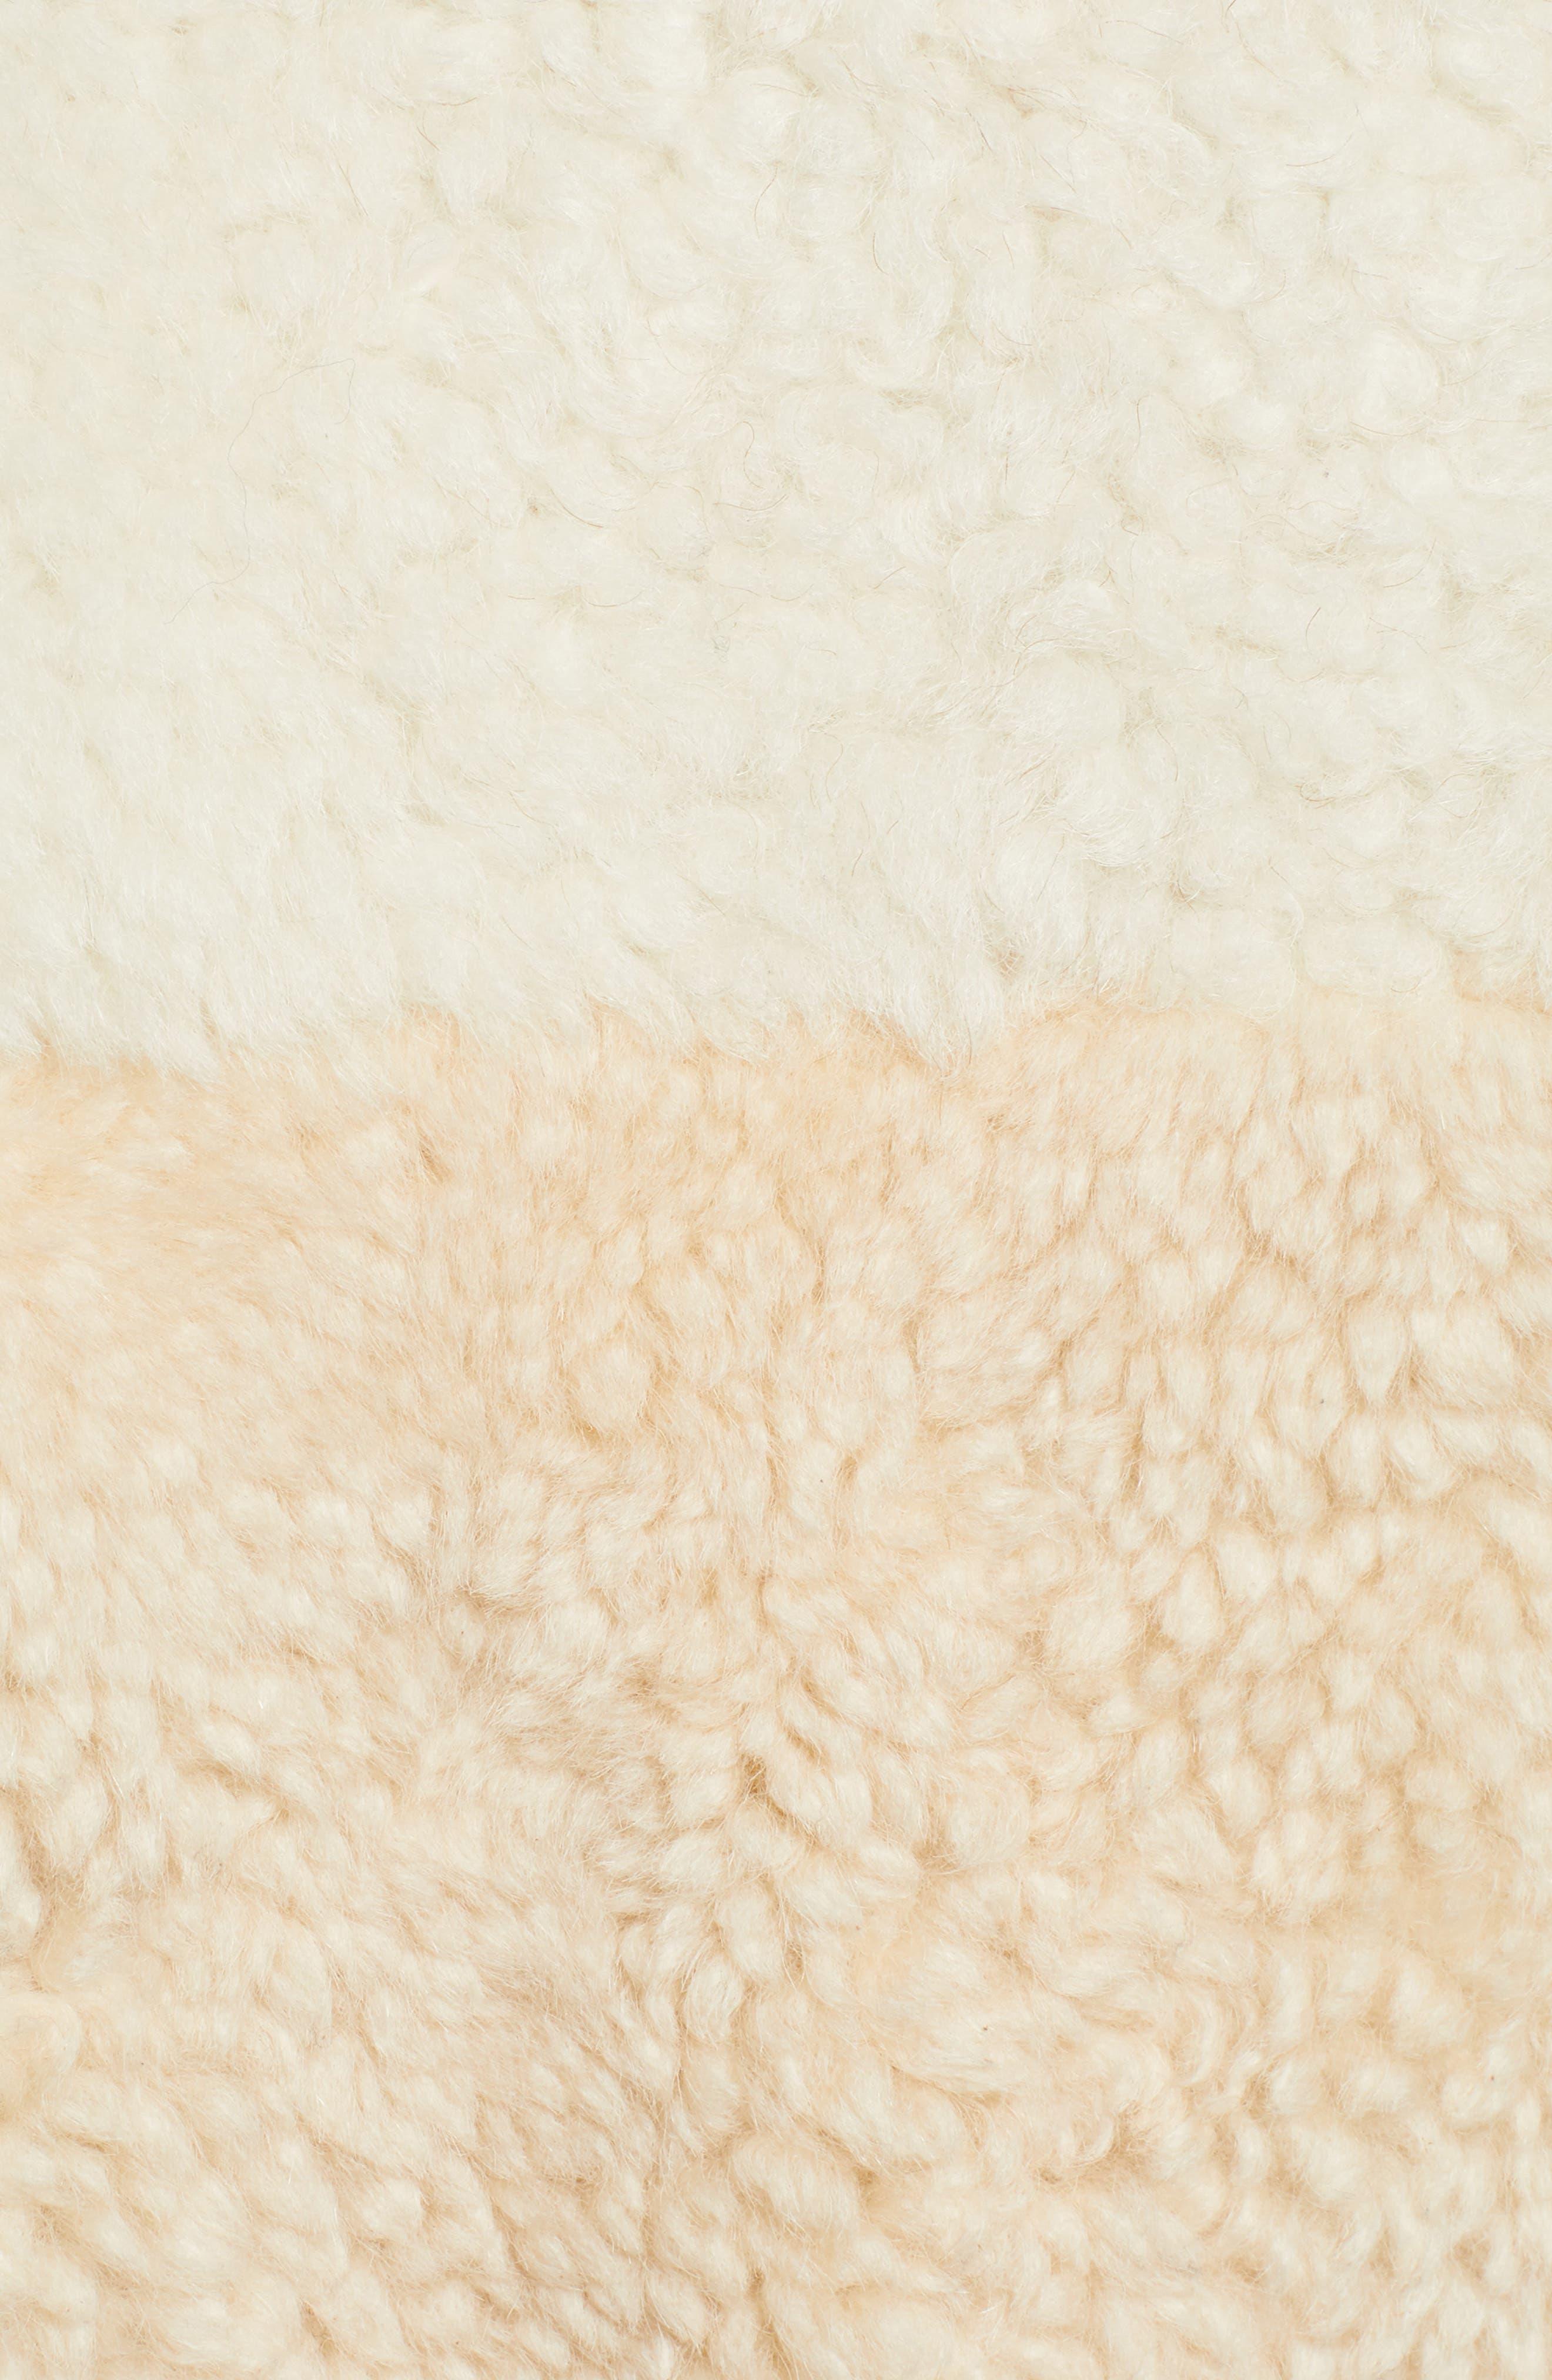 Patchwork Genuine Shearling Jacket,                             Alternate thumbnail 7, color,                             CREAM